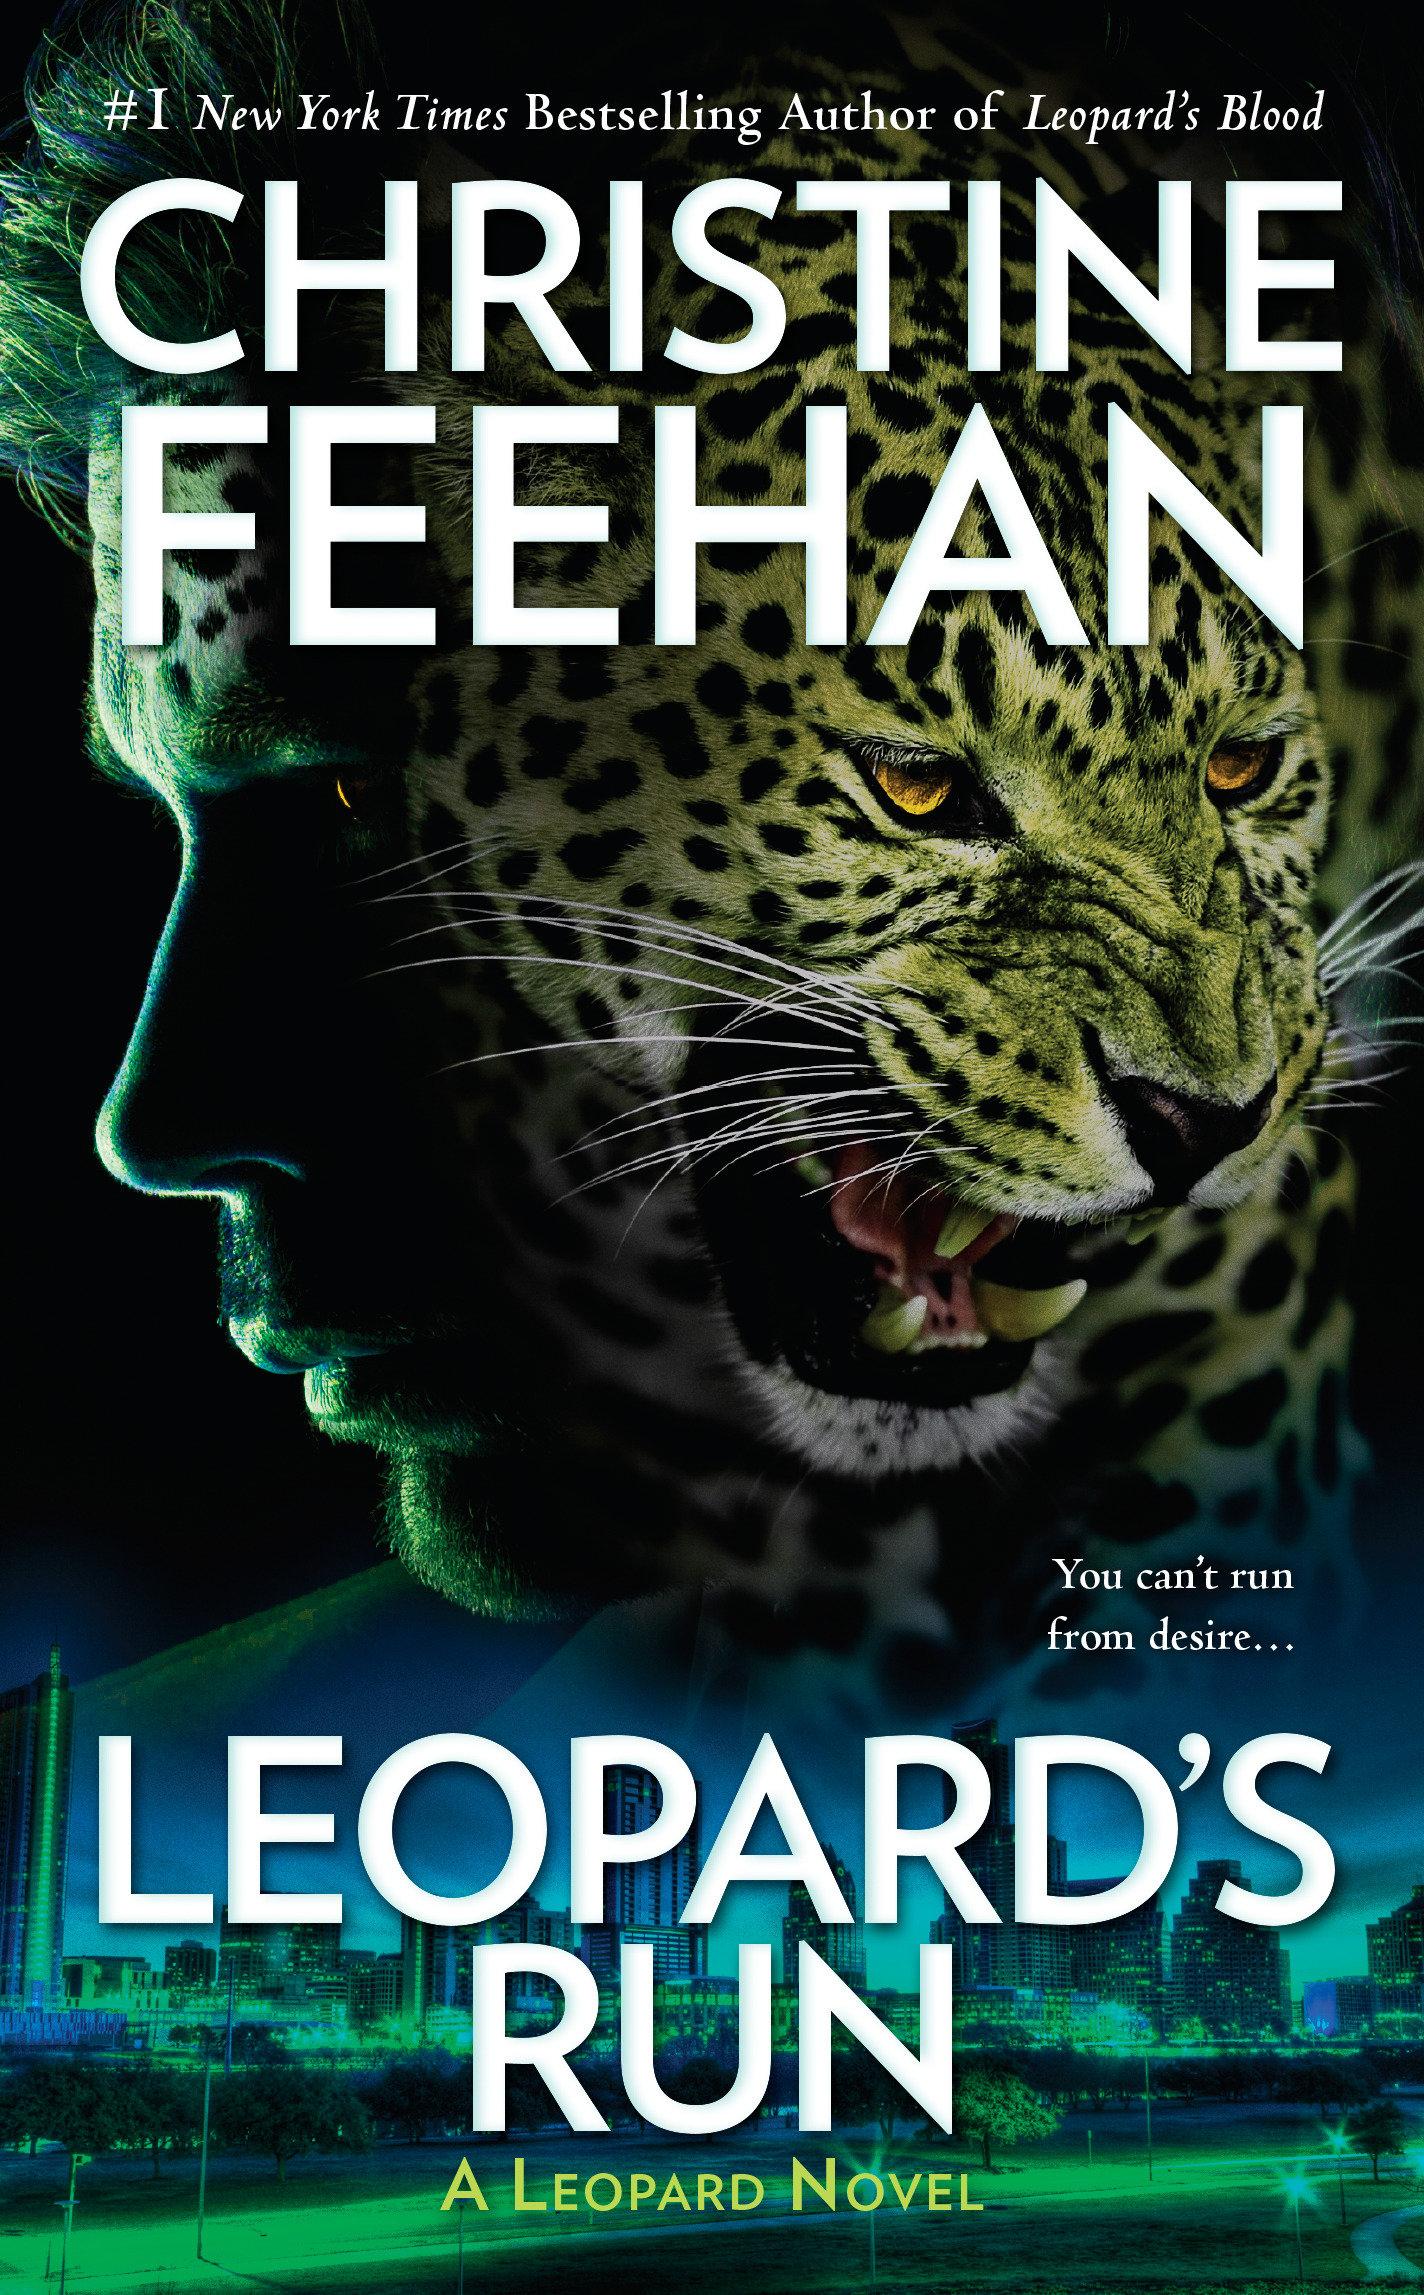 Leopard's run cover image